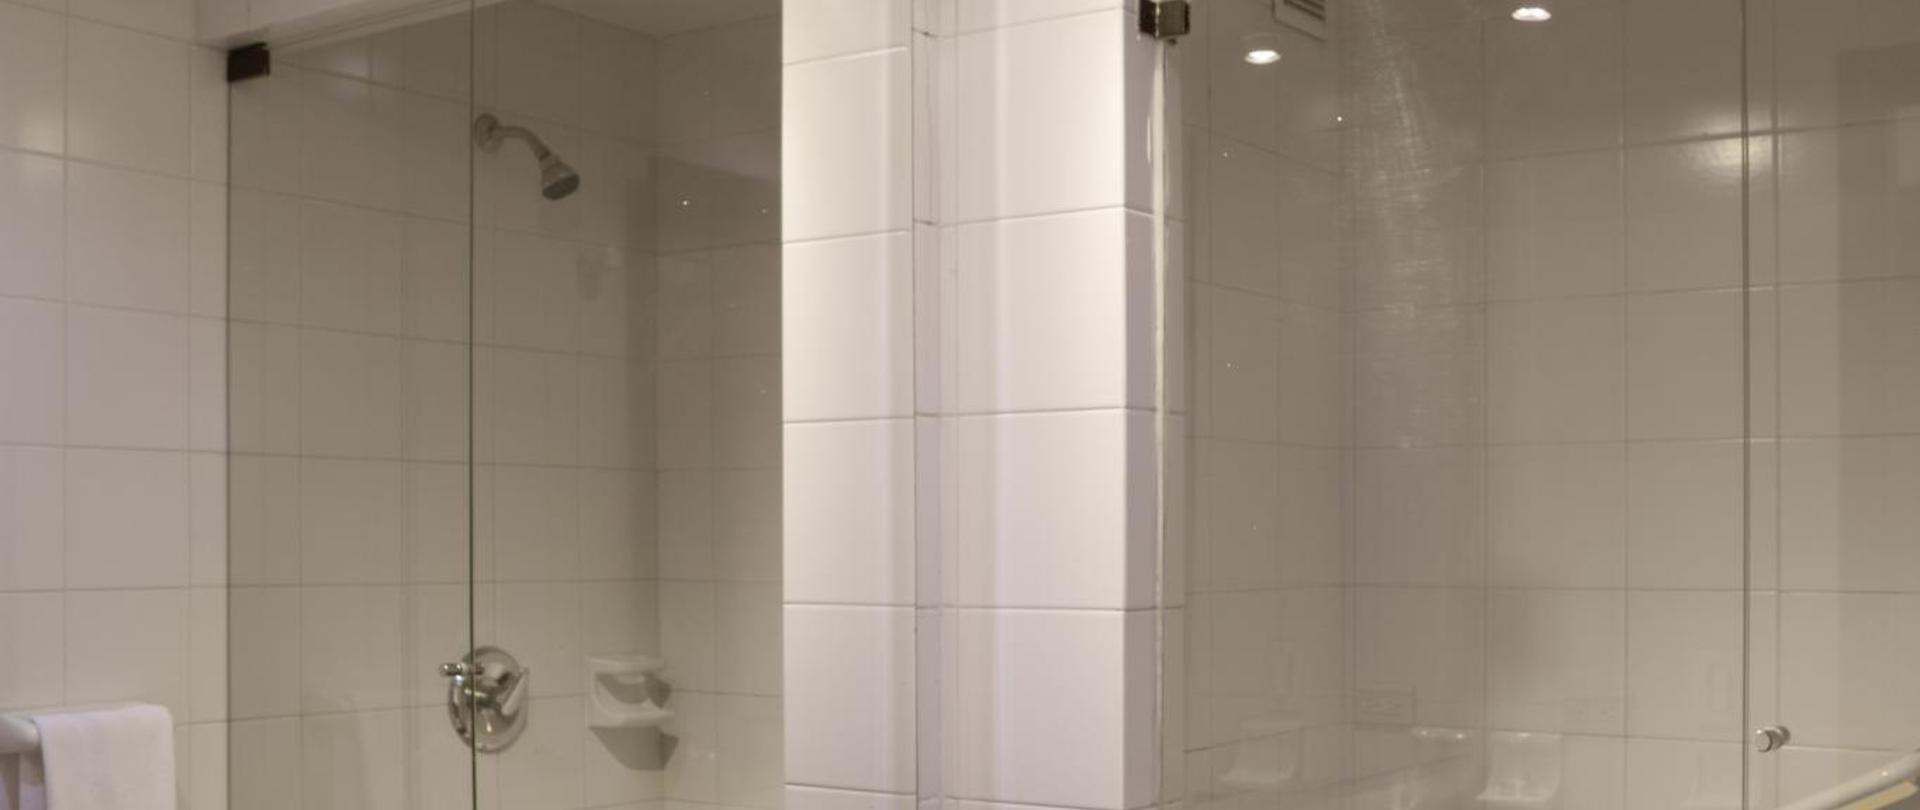 Baño St.jpg